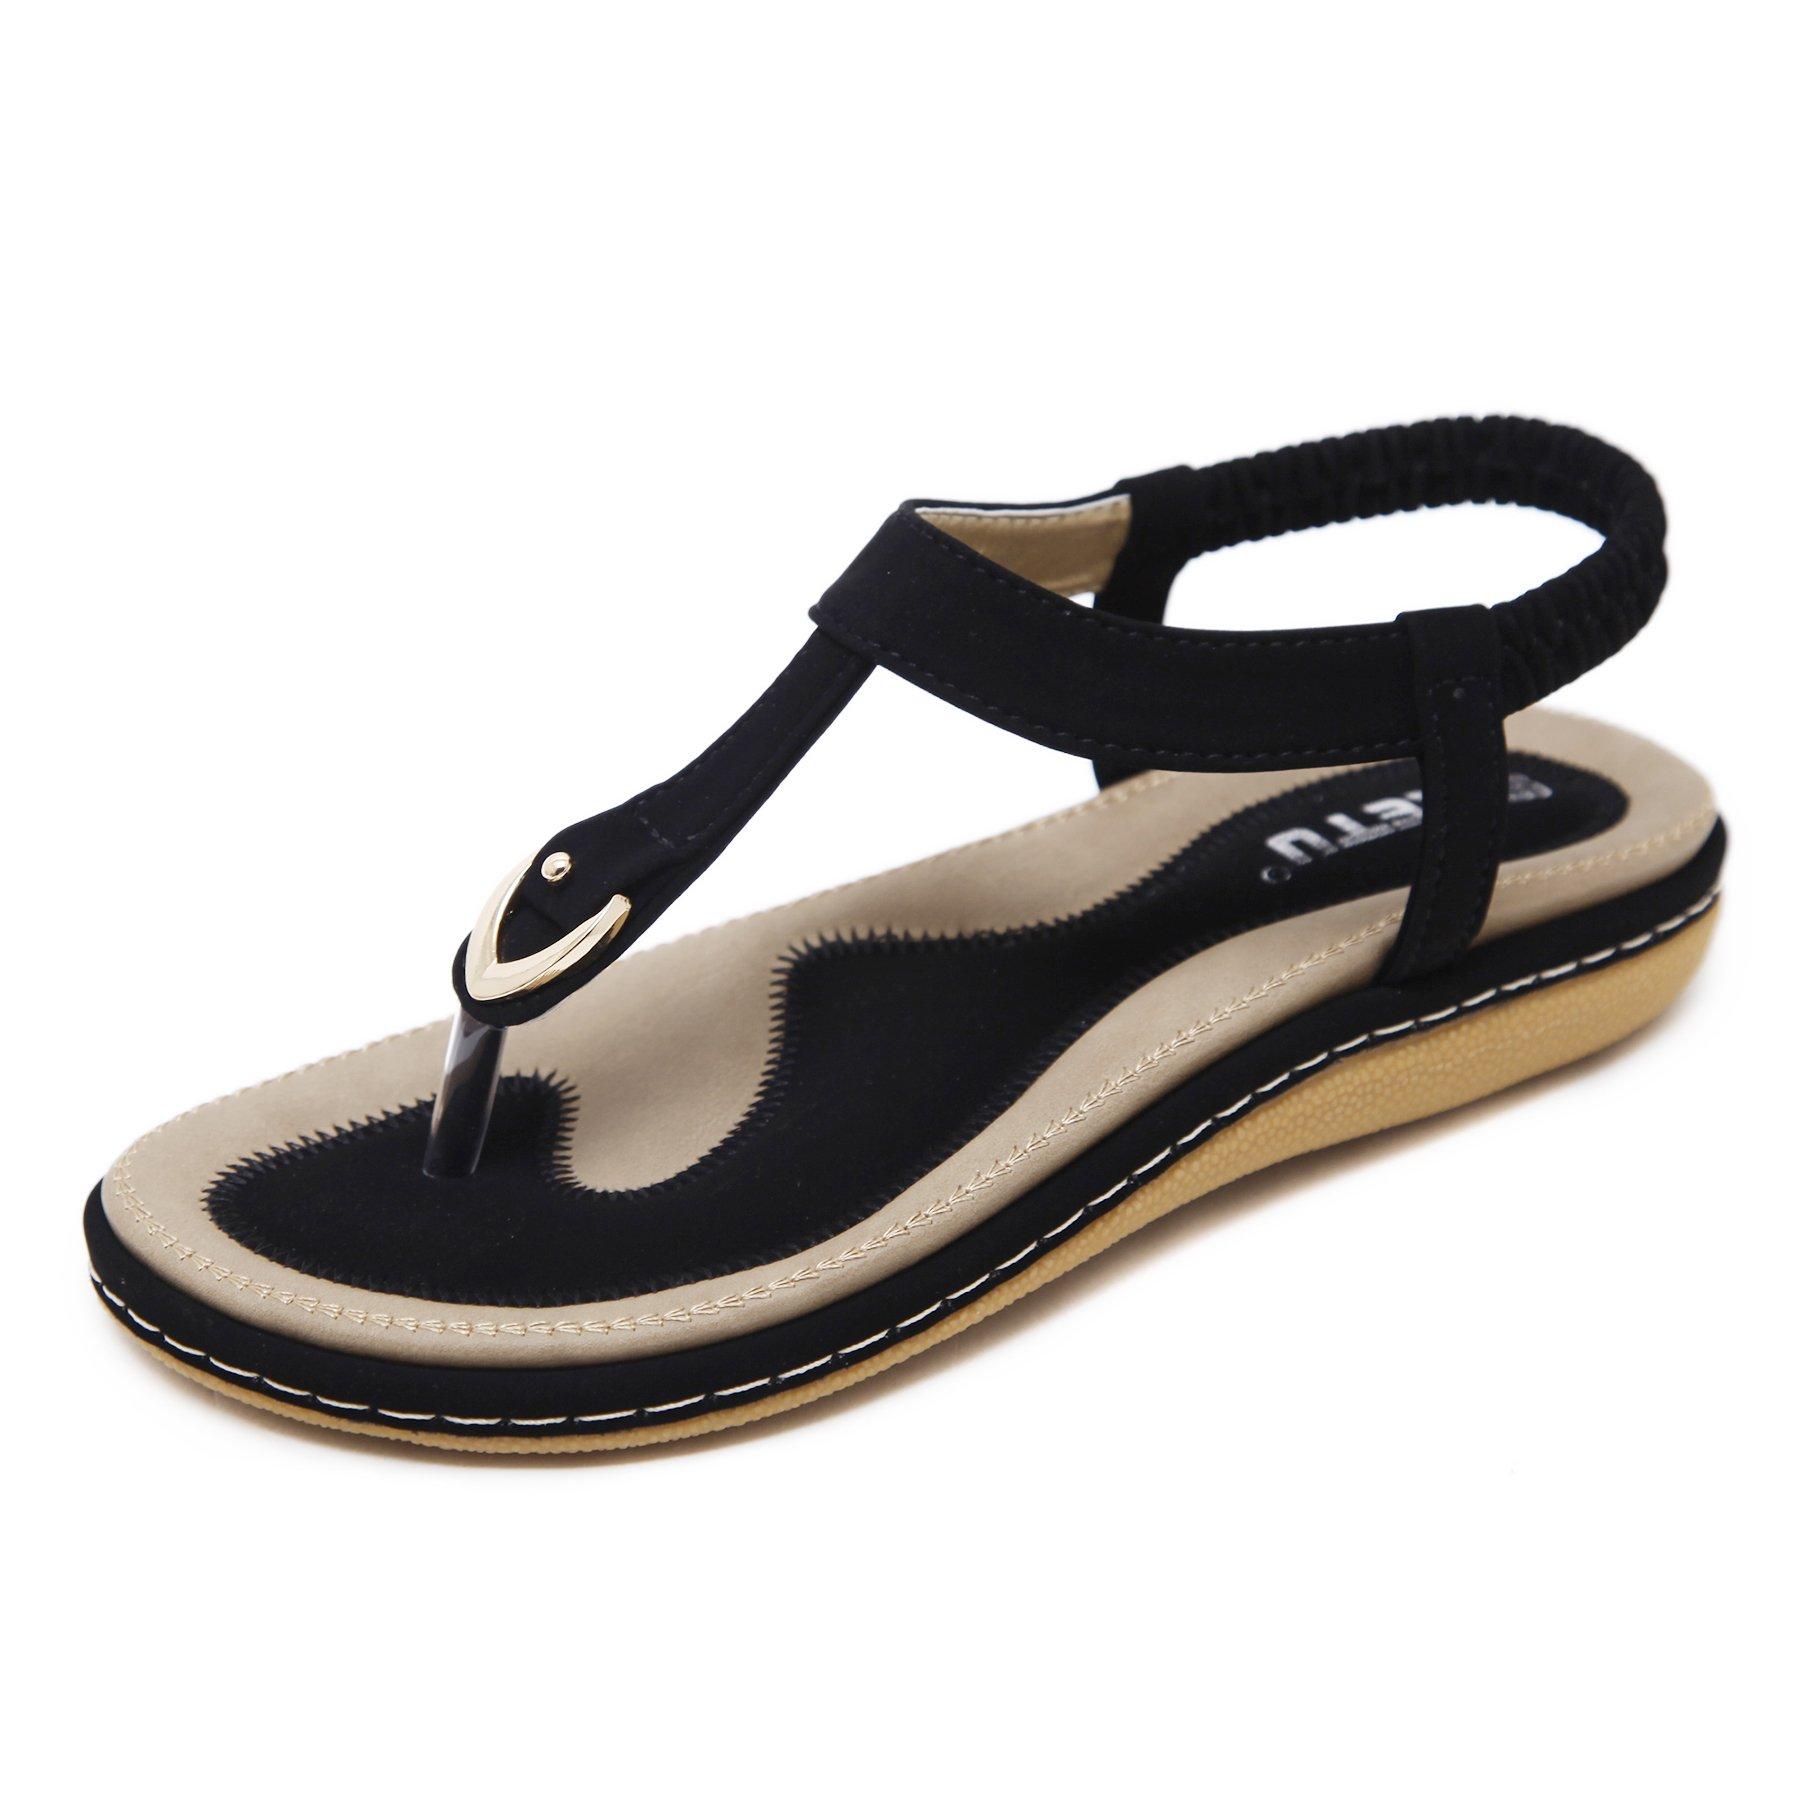 Meeshine Women's Bohemia Flip Flops Summer Beach T-Strap Flat Sandals Comfort Walking Shoes (8, Black)